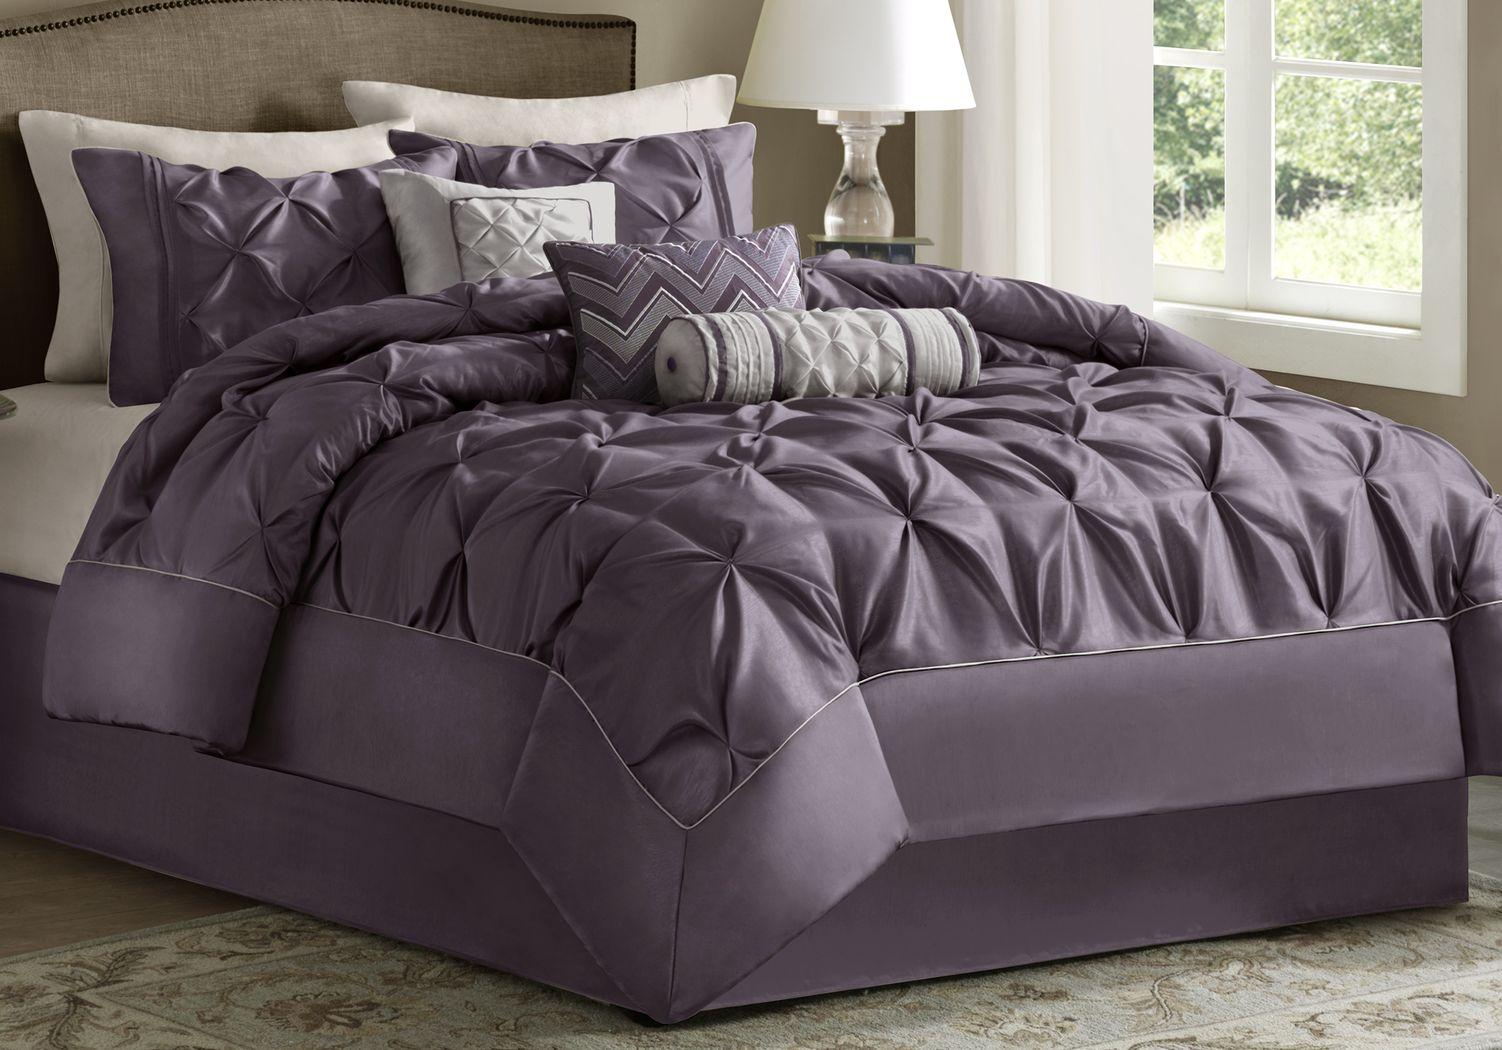 Janelle Plum 7 Pc King Comforter Set